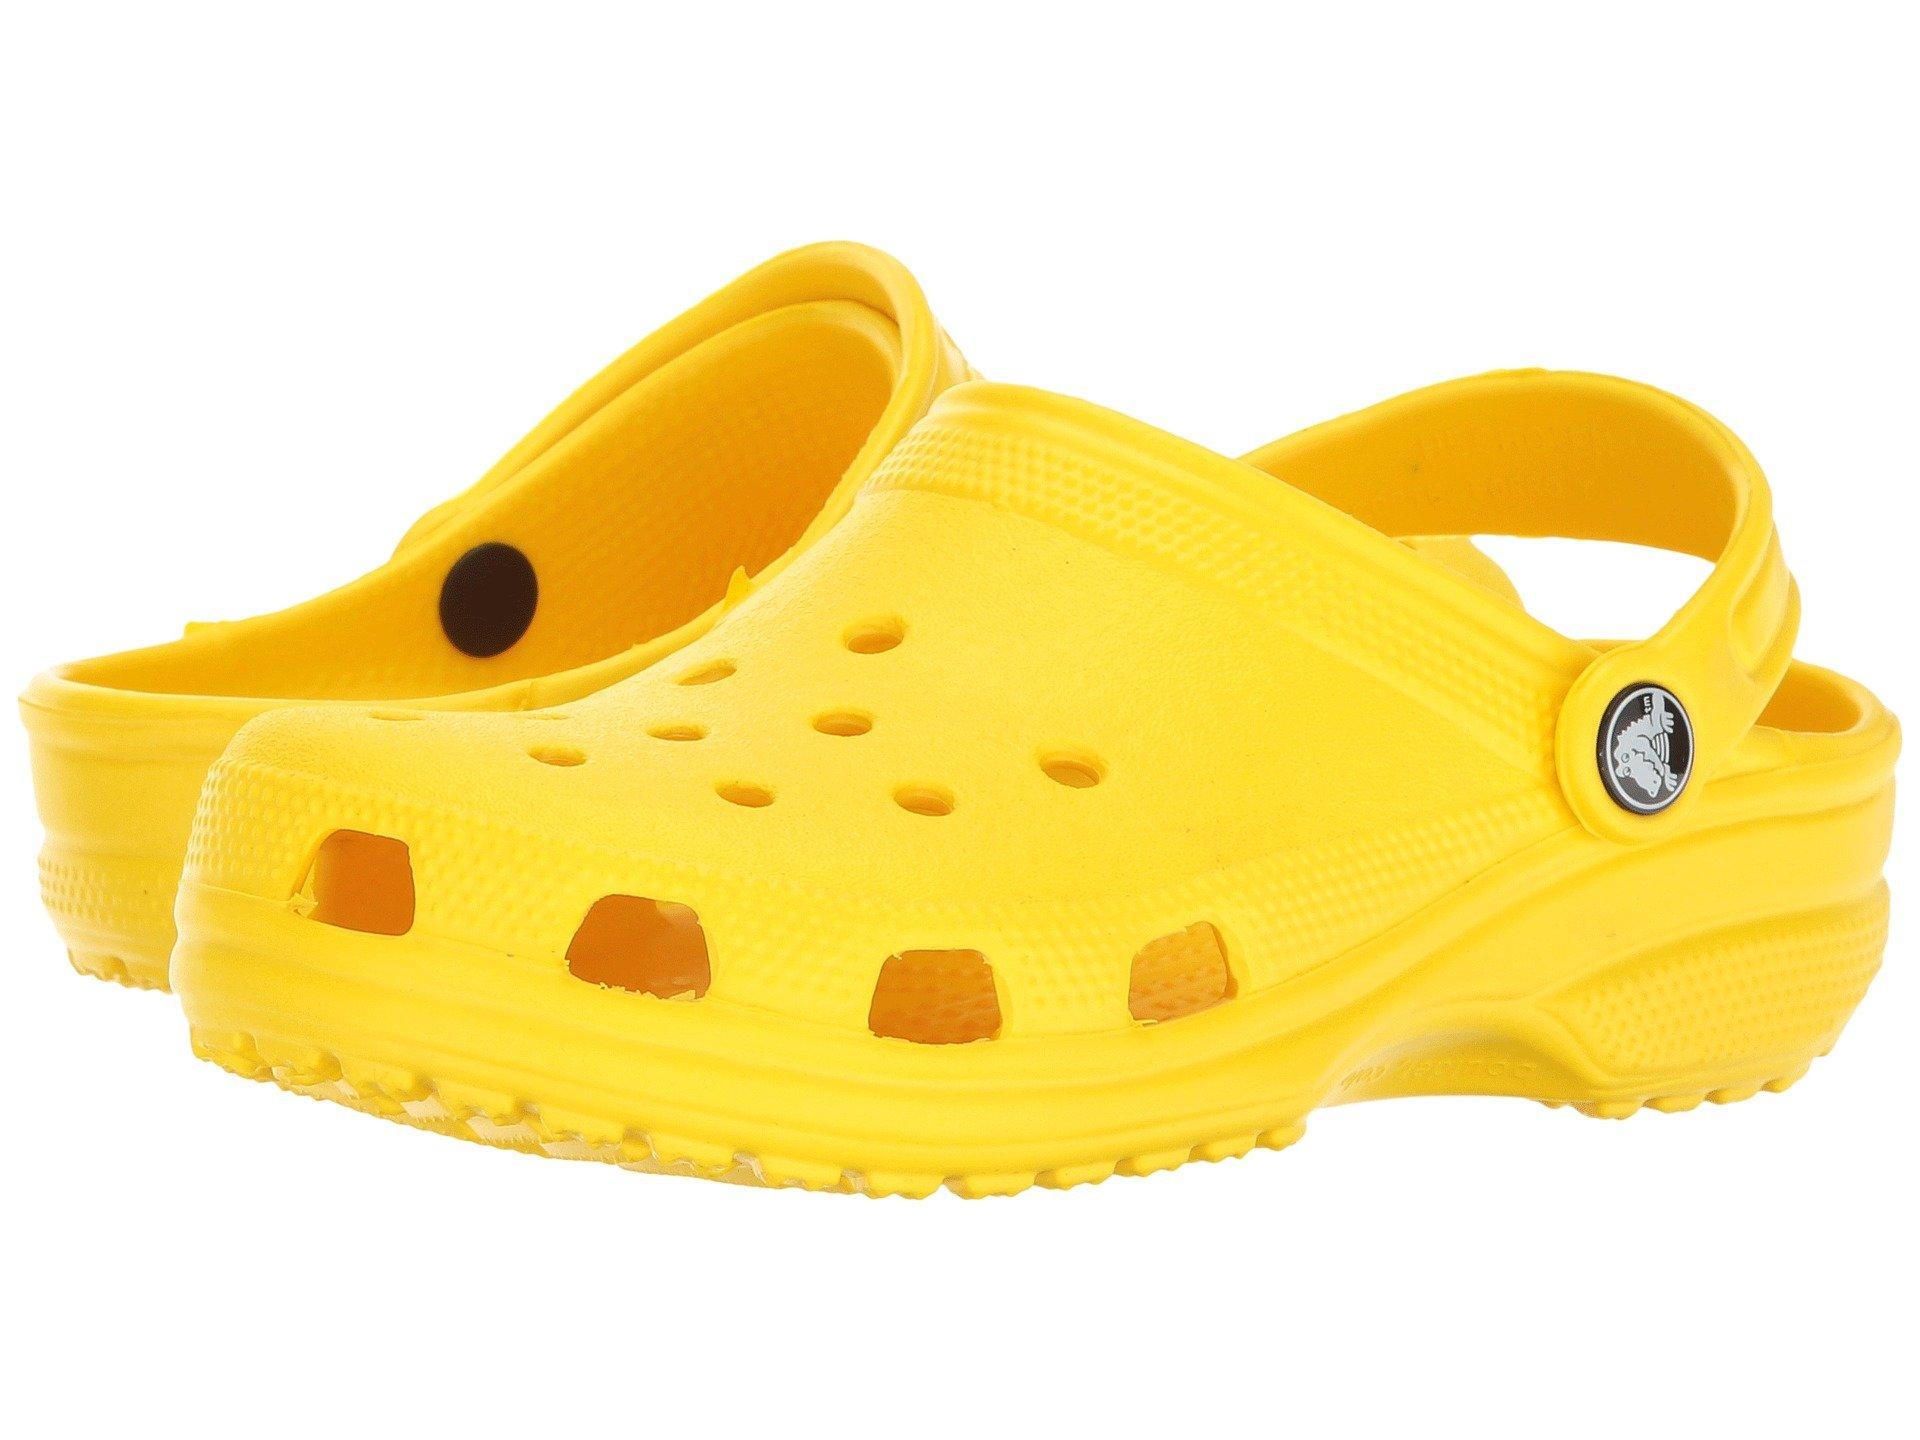 Crocs Unisex Classic Clog, Lemon, 6 US Men/8 US Women